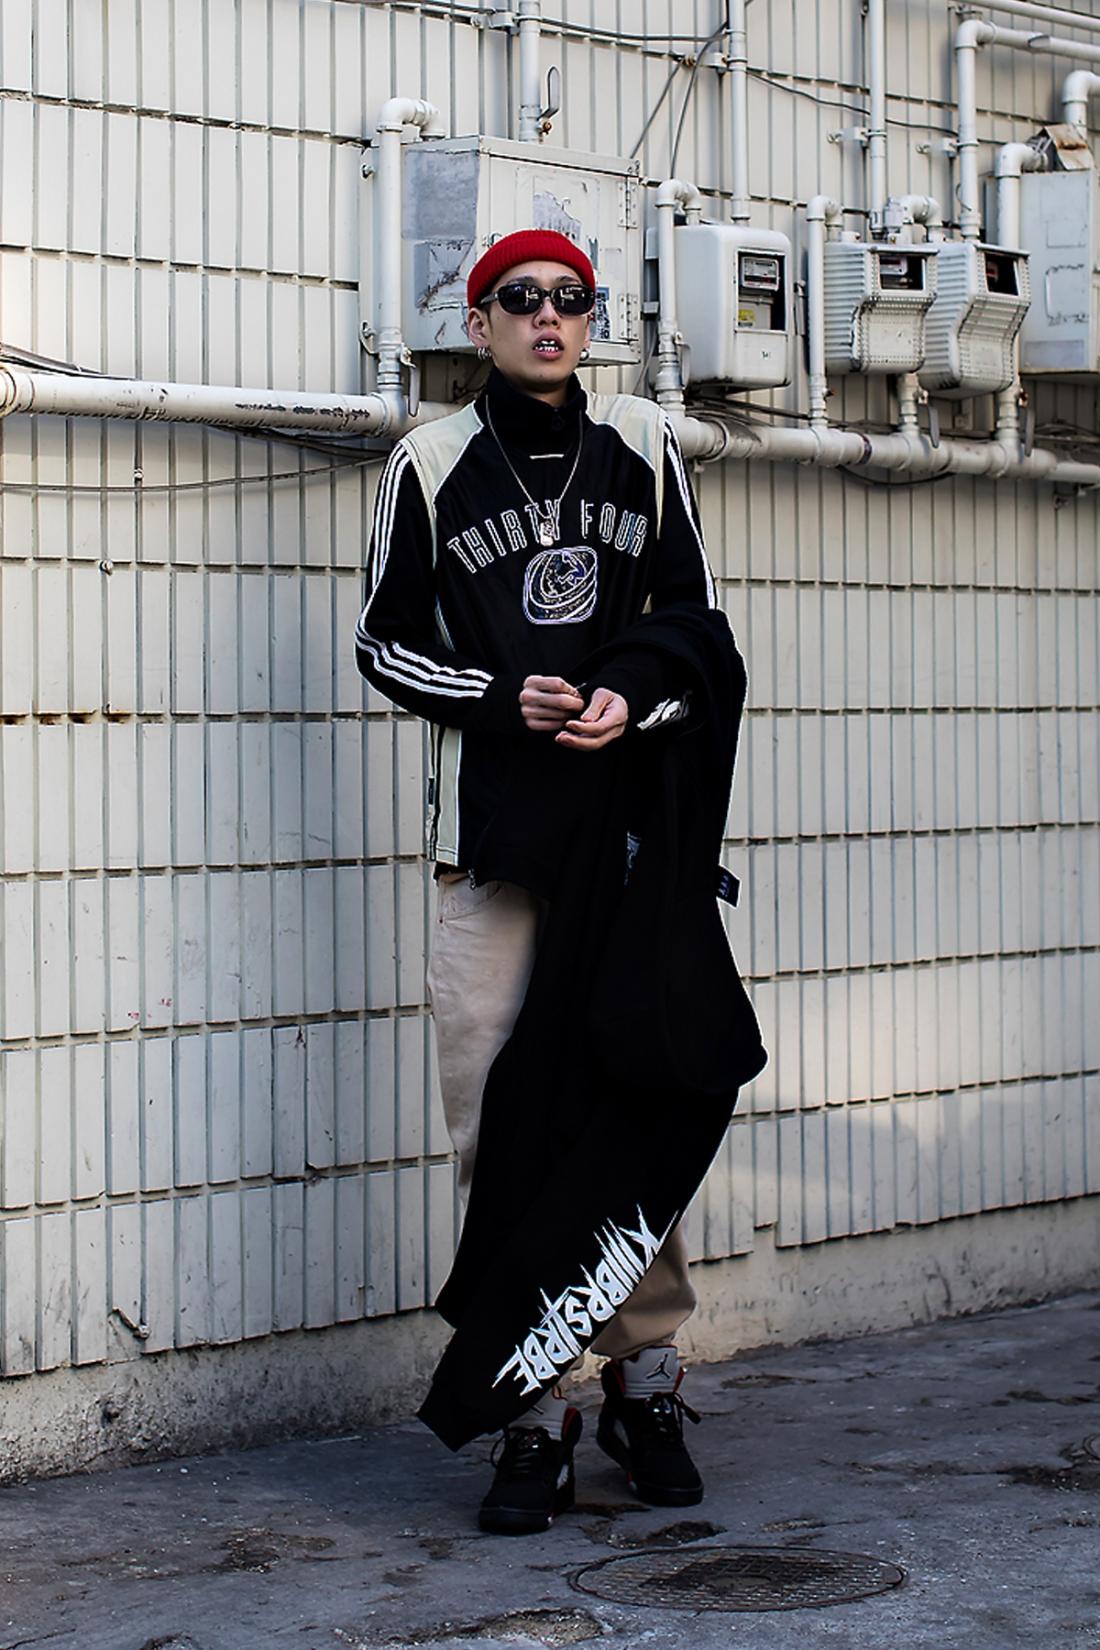 Lee Jaehyuk, Street Fashion 2017 in SEOUL.jpg